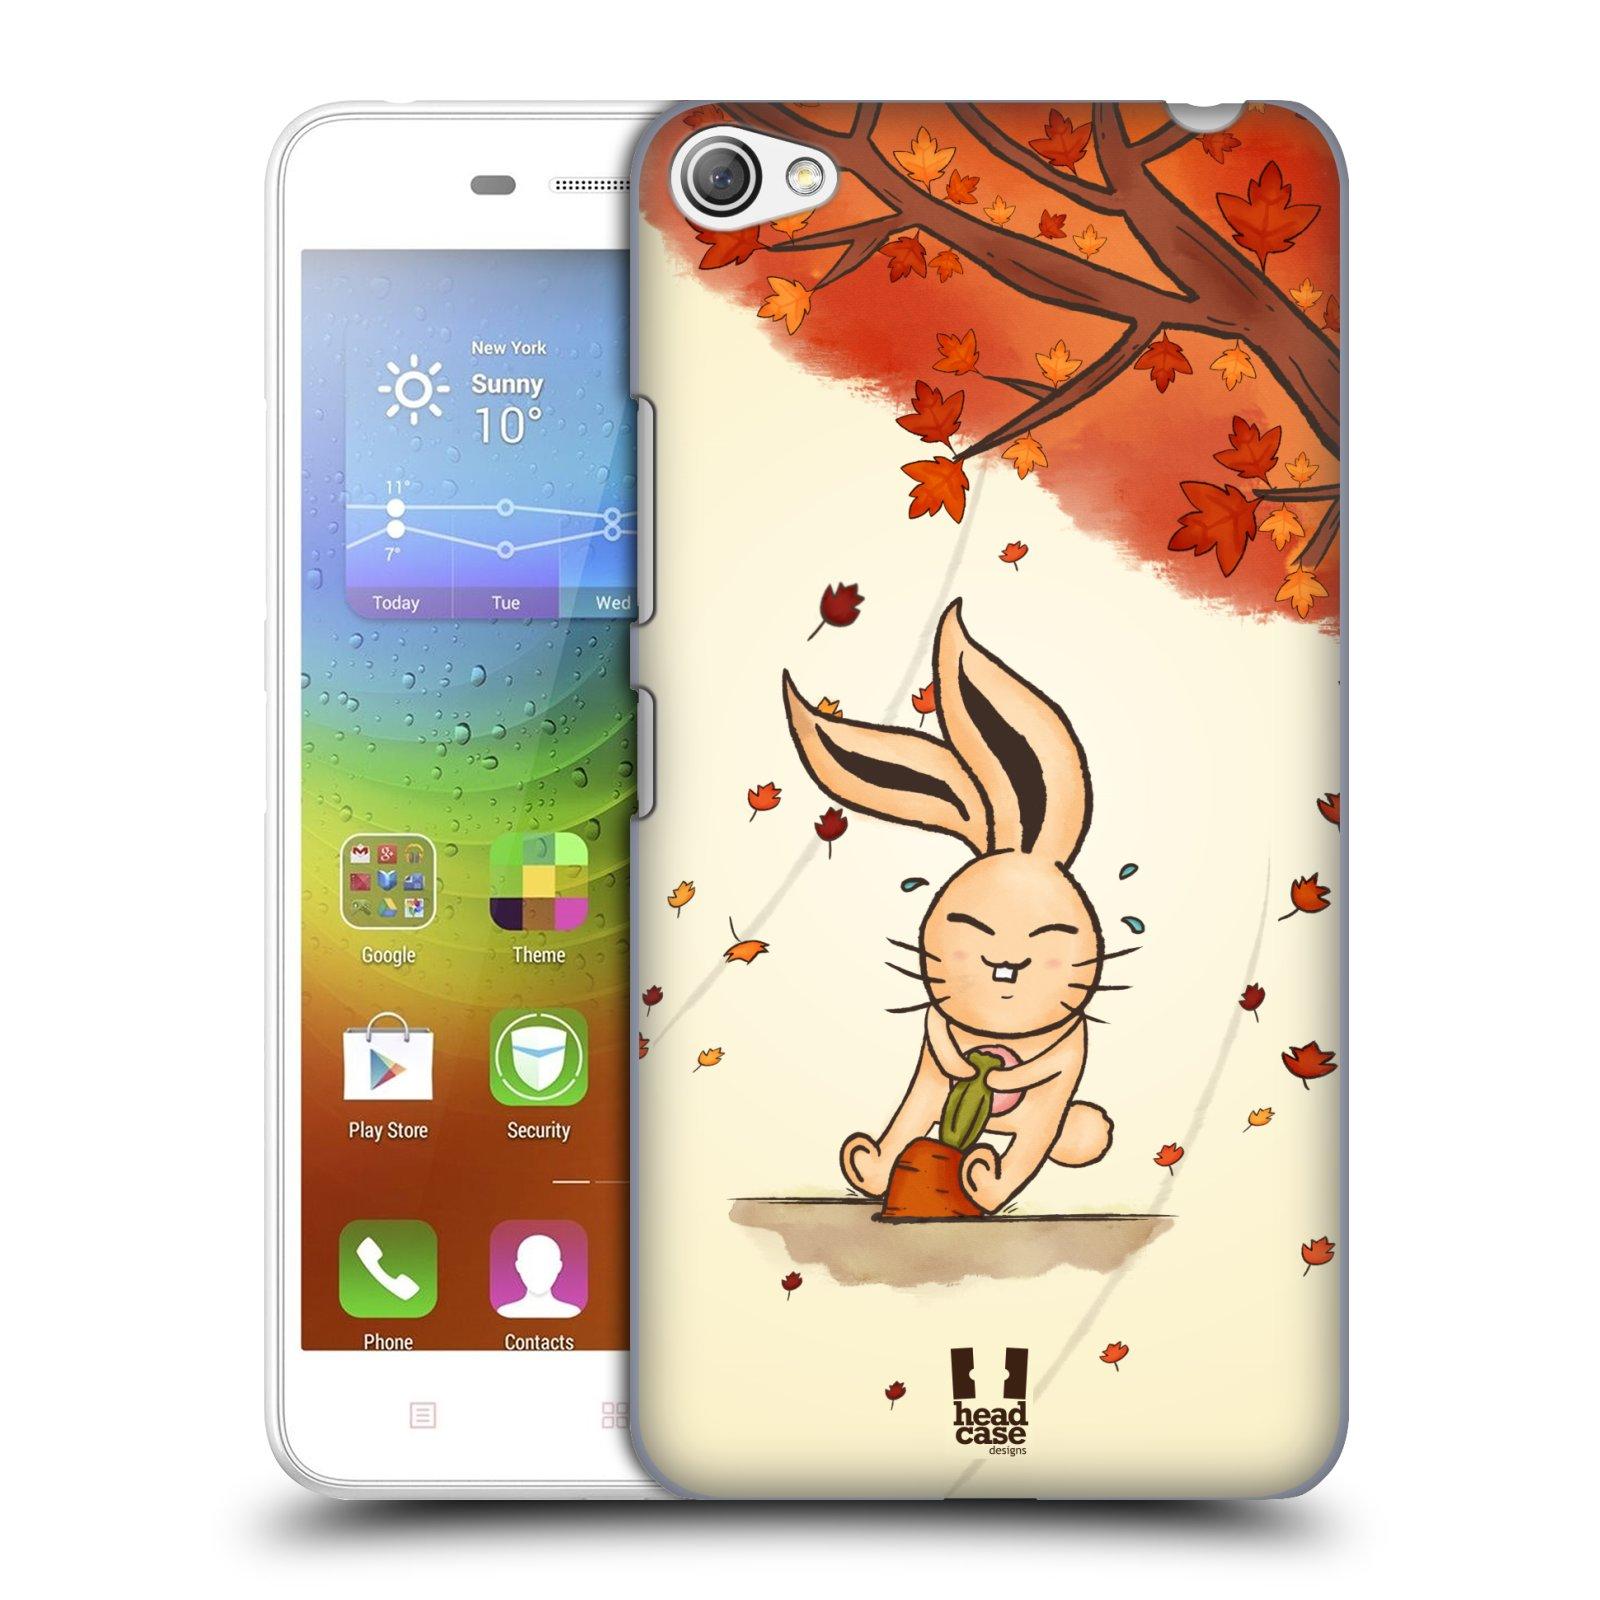 HEAD CASE pevný plastový obal na mobil LENOVO S60 / LENOVO S60 DUAL SIM vzor podzimní zvířátka zajíček a mrkev